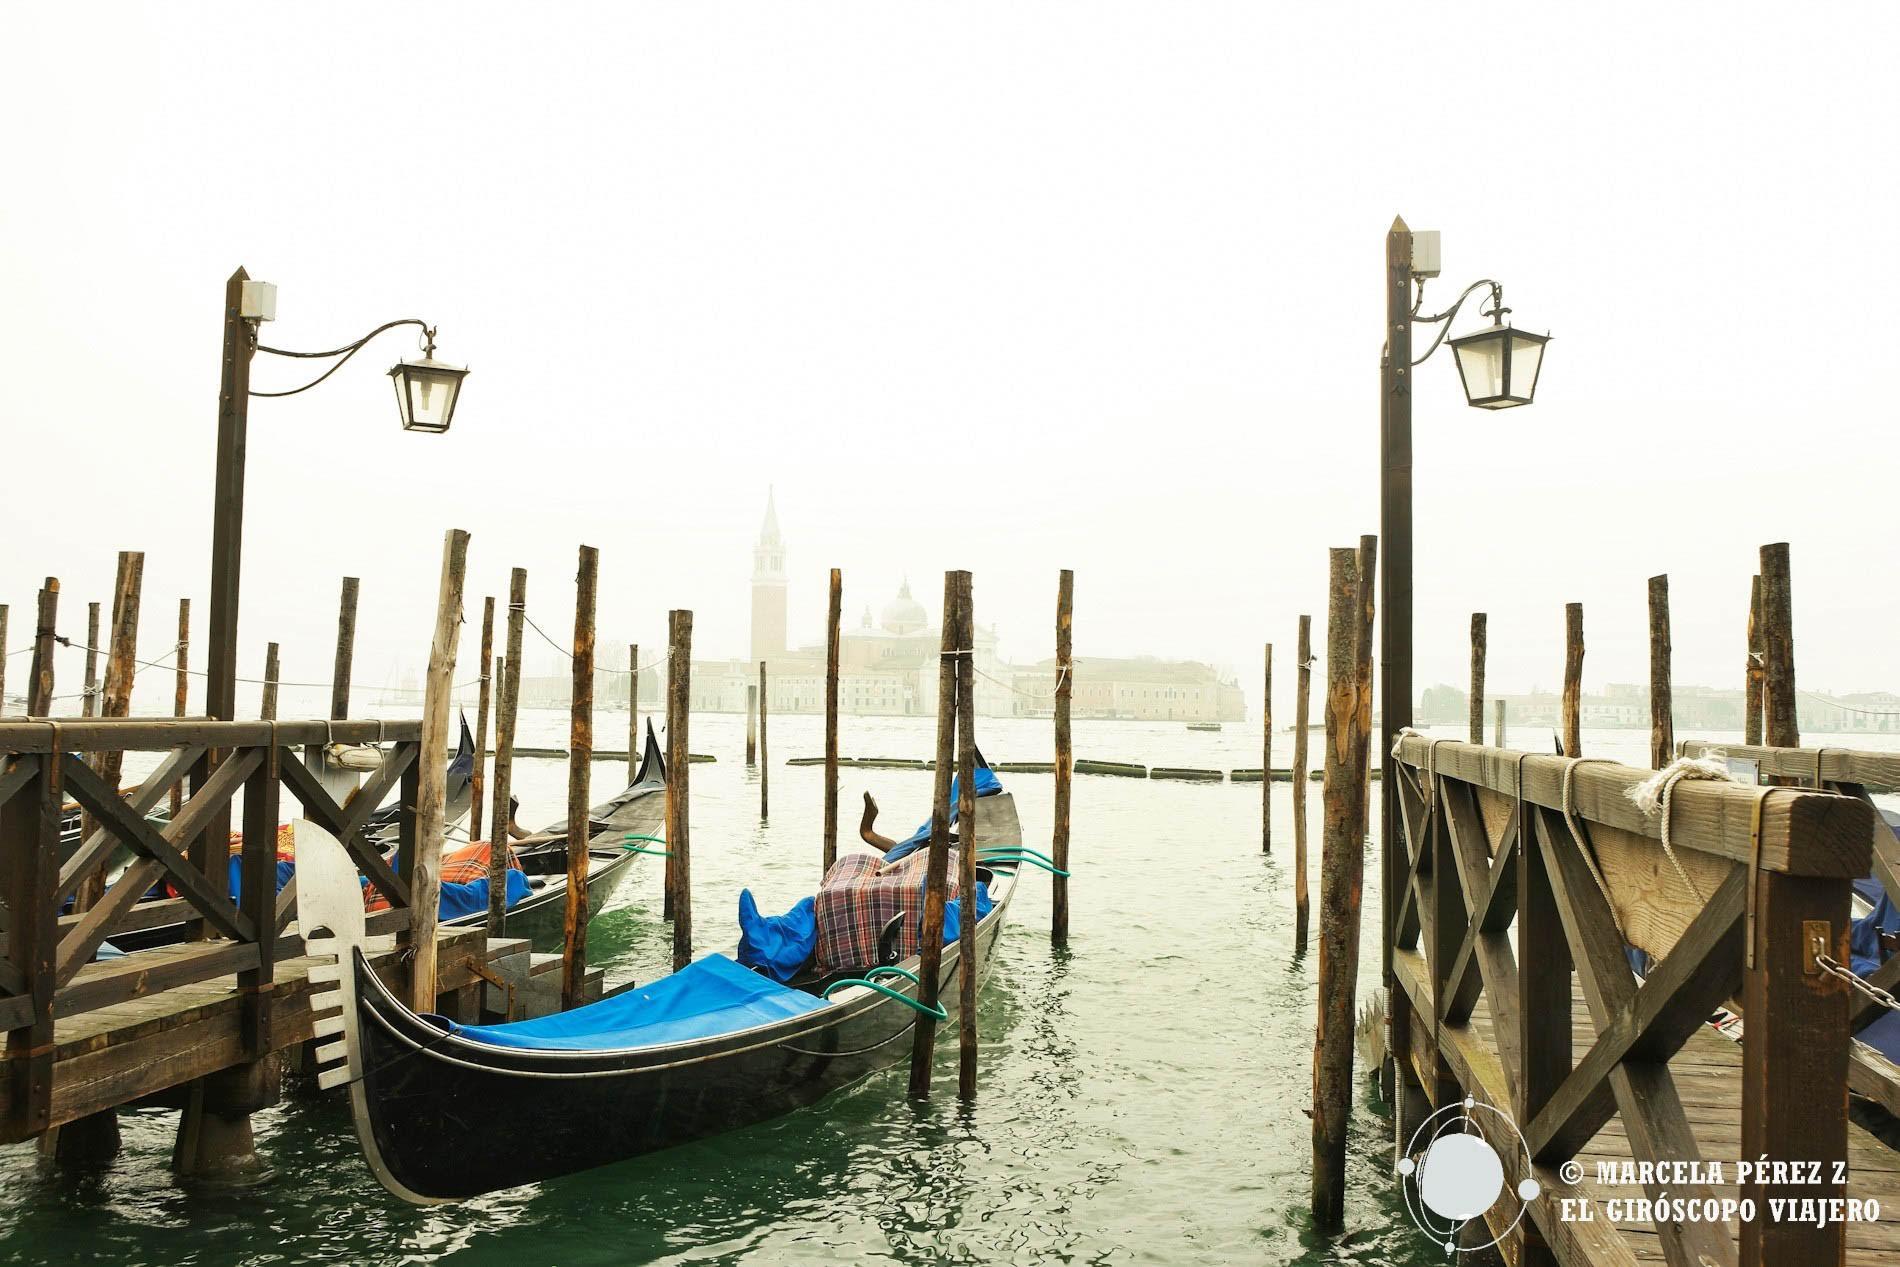 El paisaje brumoso de una mañana invernal en Venecia ©Marcela Pérez Z.